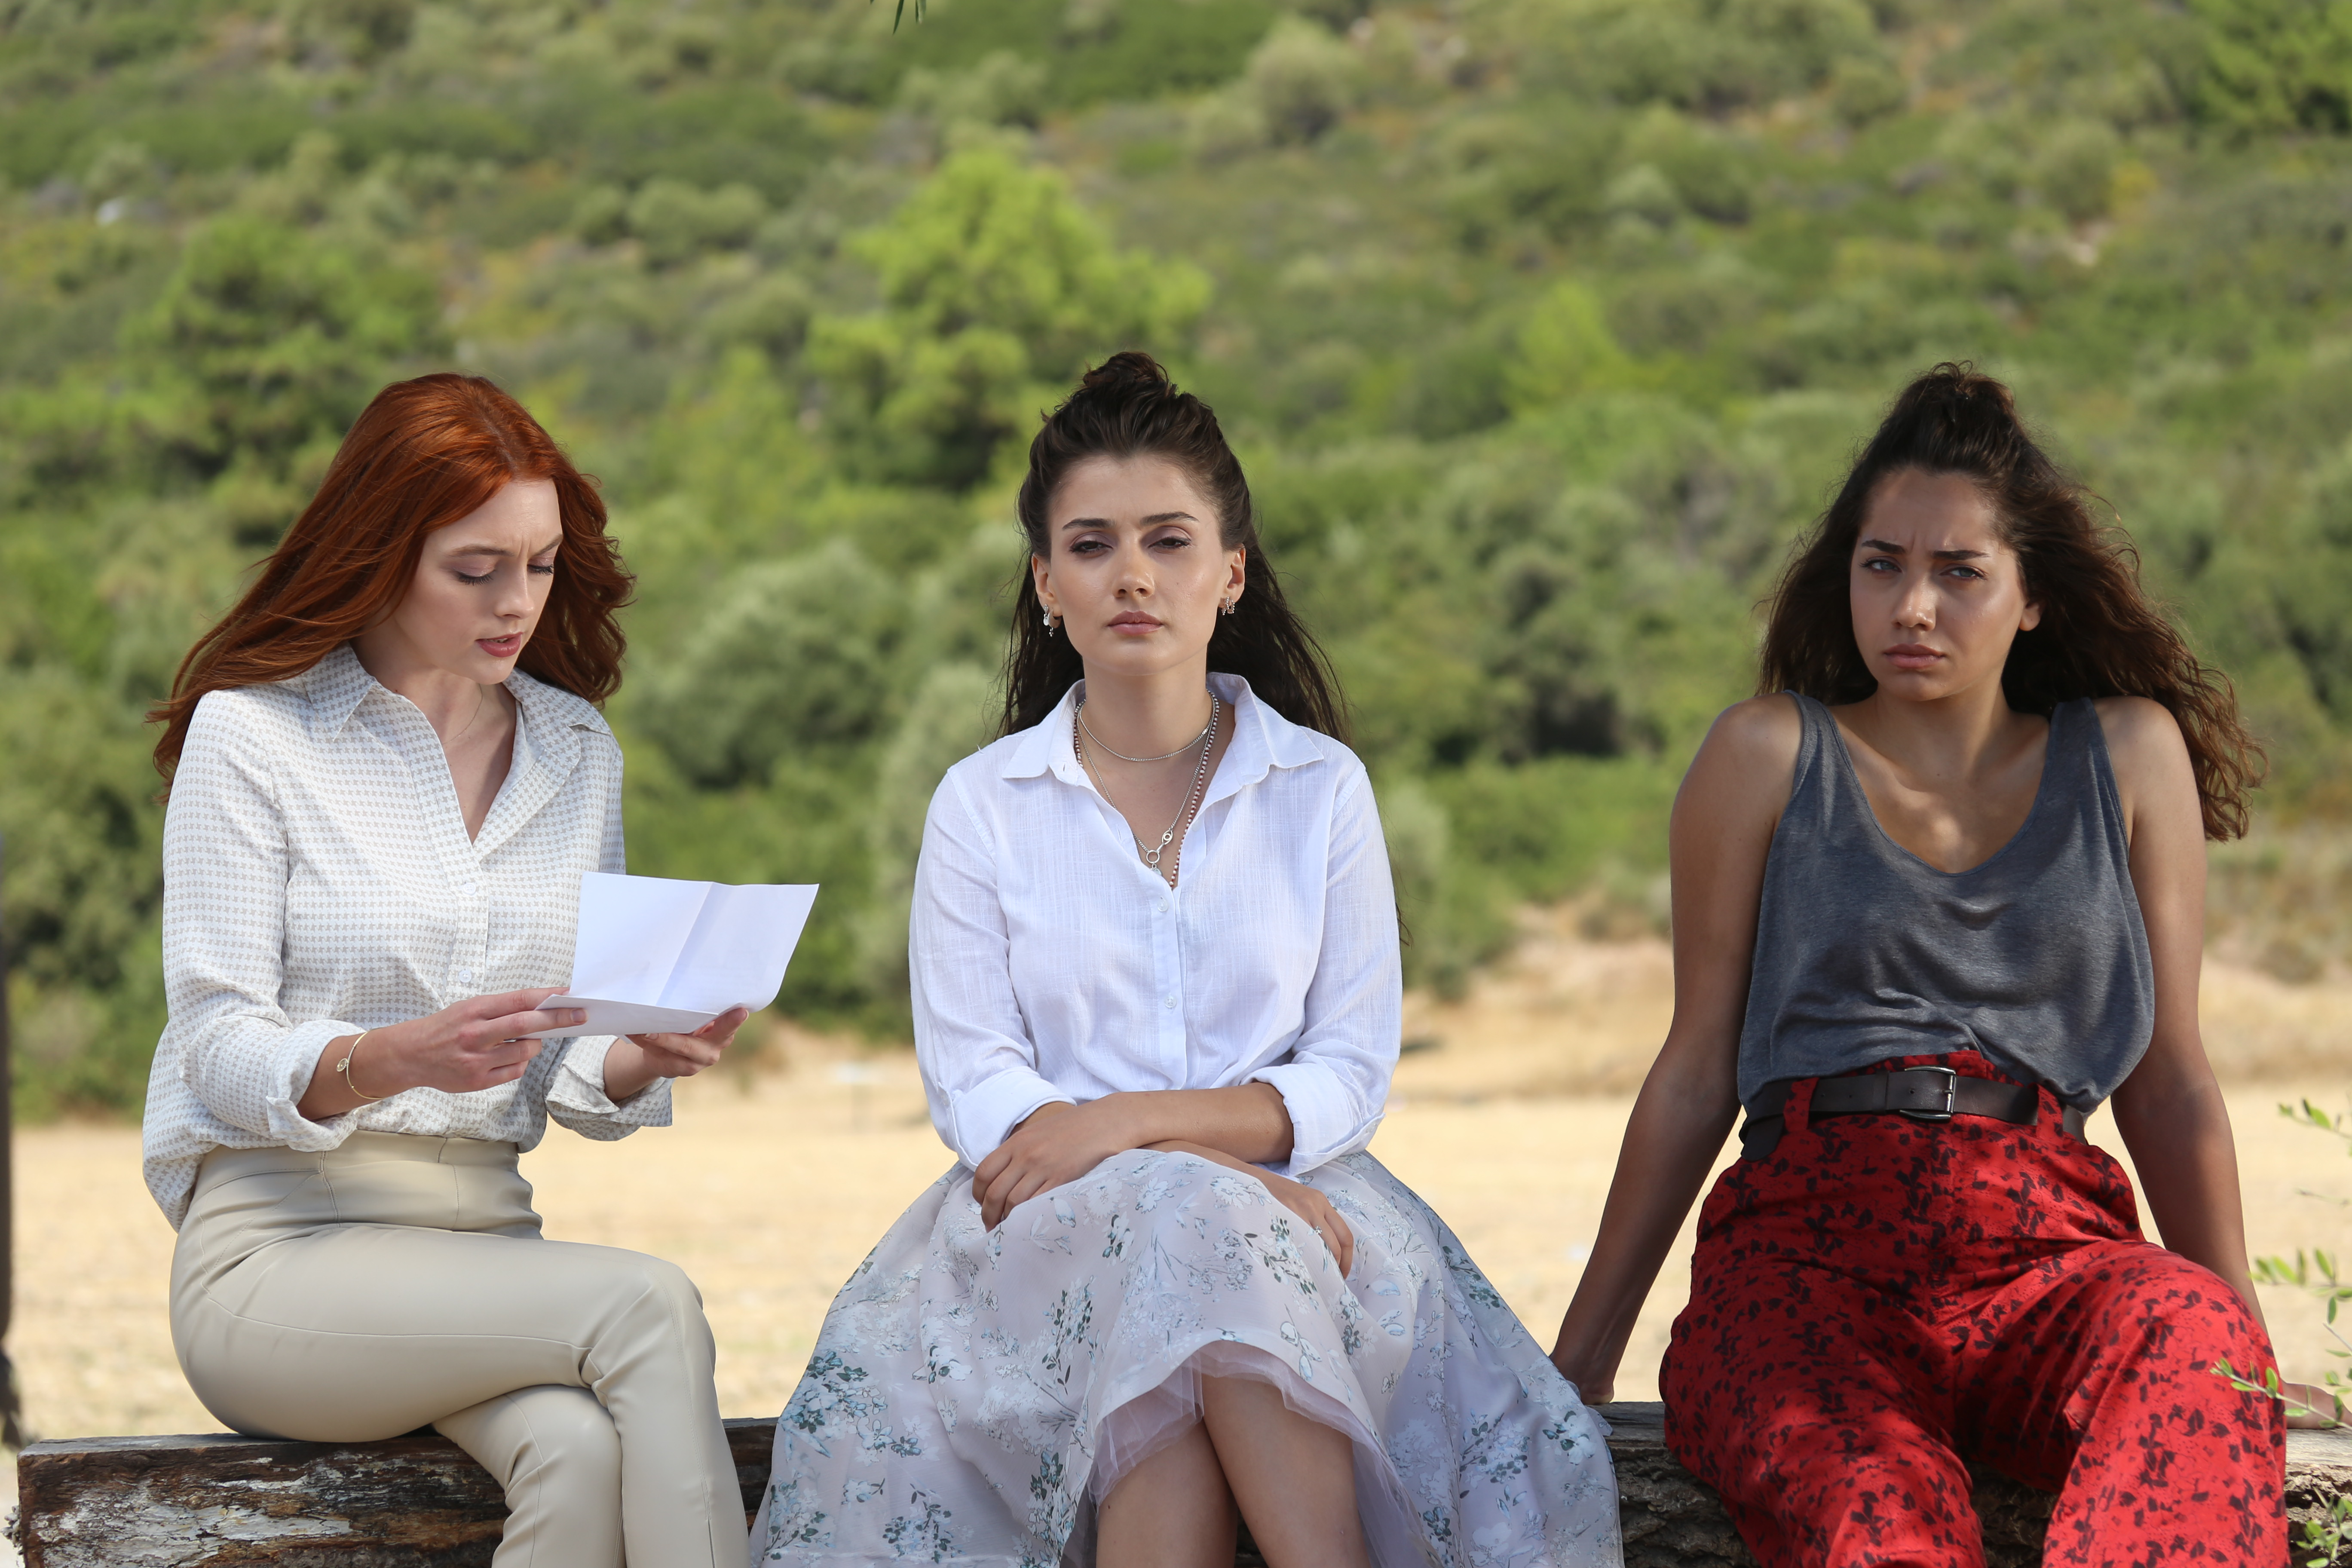 Turkish Dramas at Mipcom Explore Edgier Subjects While Production Resumes